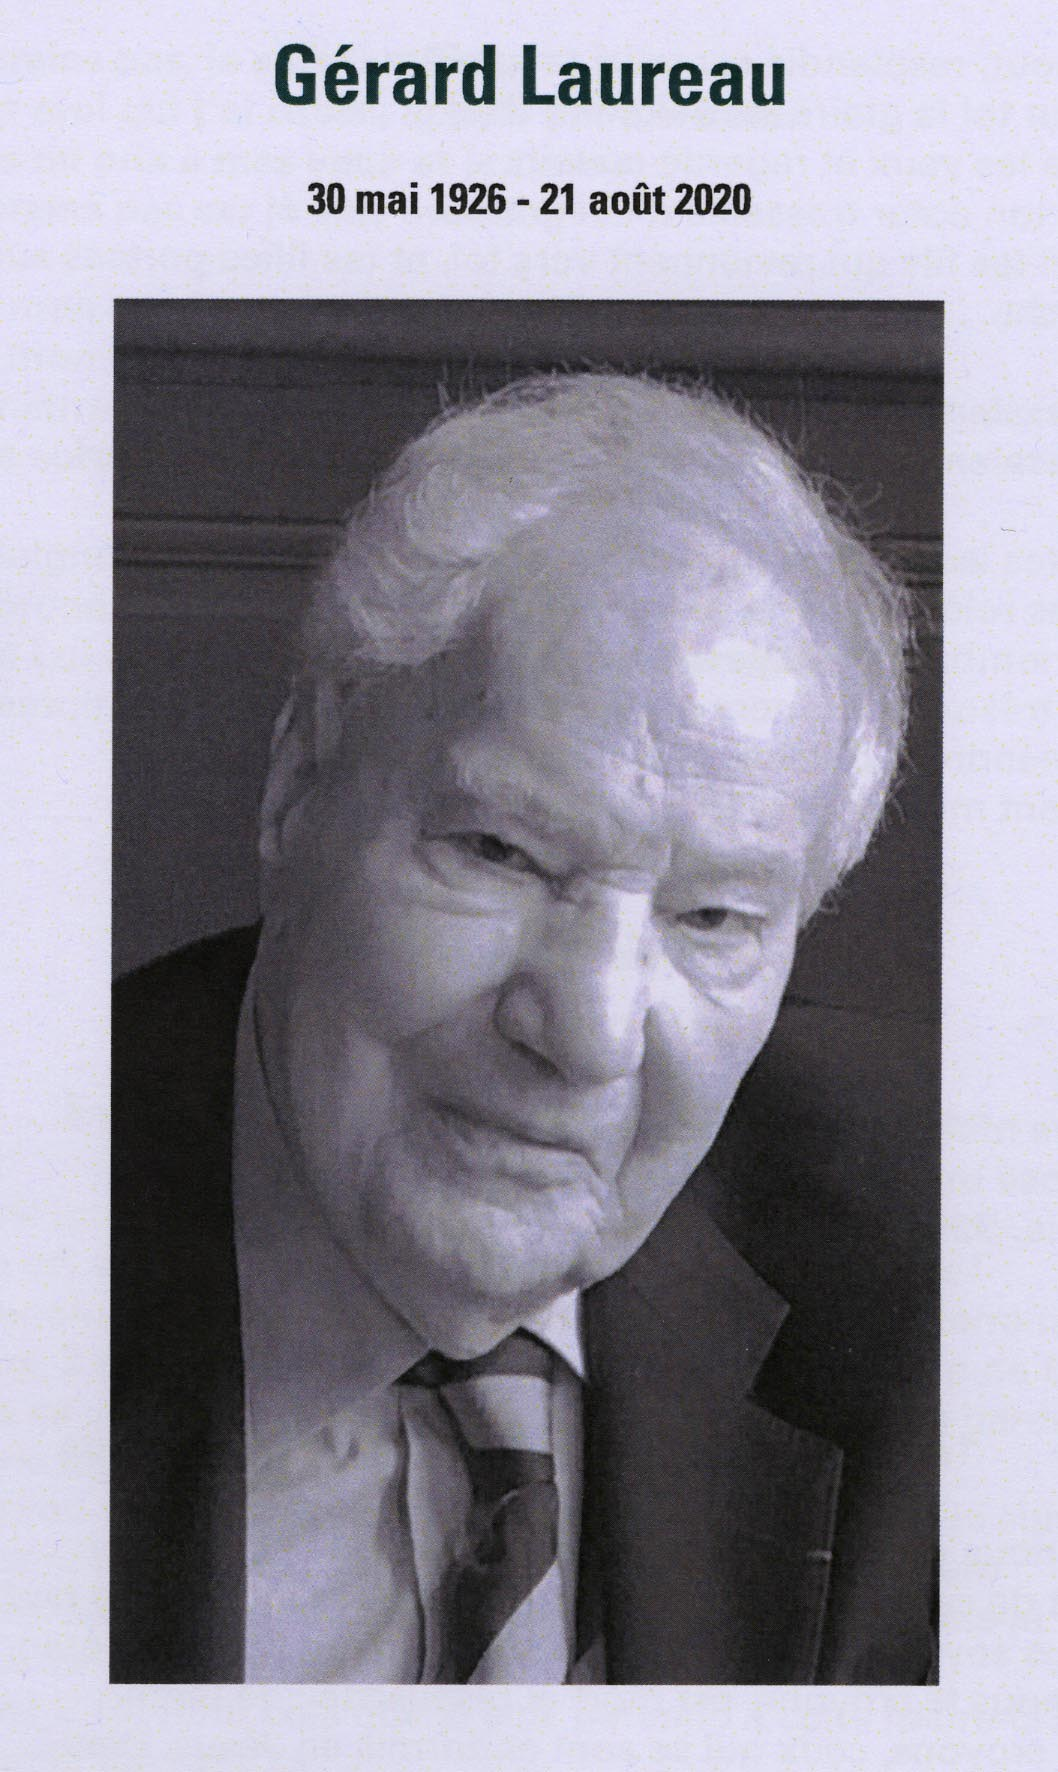 Gérard Laureau